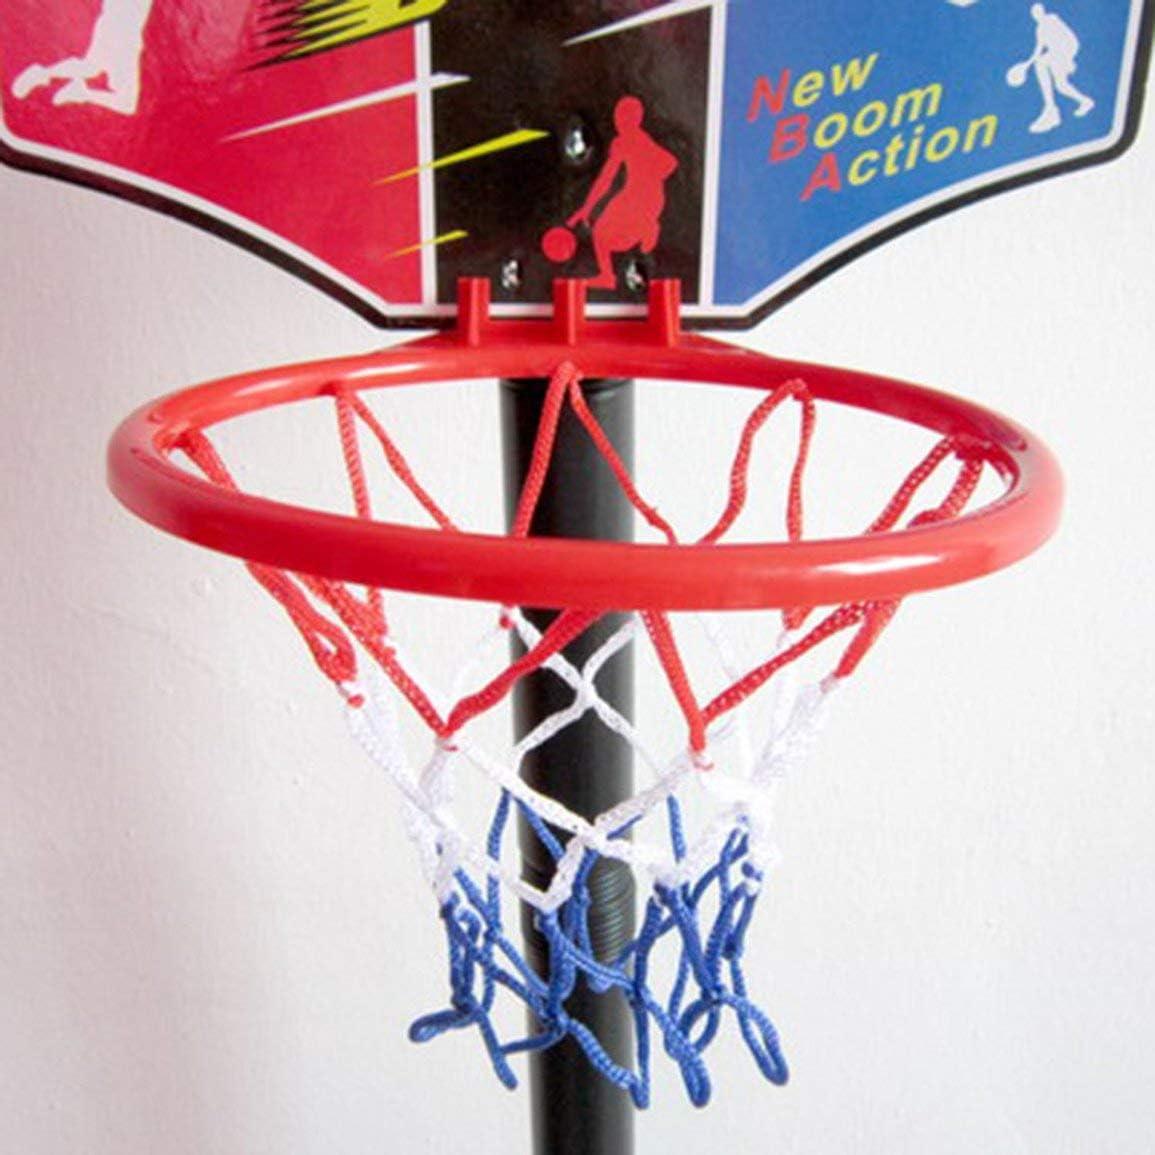 Fantasyworld Kinder Geschenk Basketball-Standplatz Adjustable Outdoor Indoor Sports beweglicher Basketballkorb Spielzeug-Set St/änder Kugel Backboard Kit